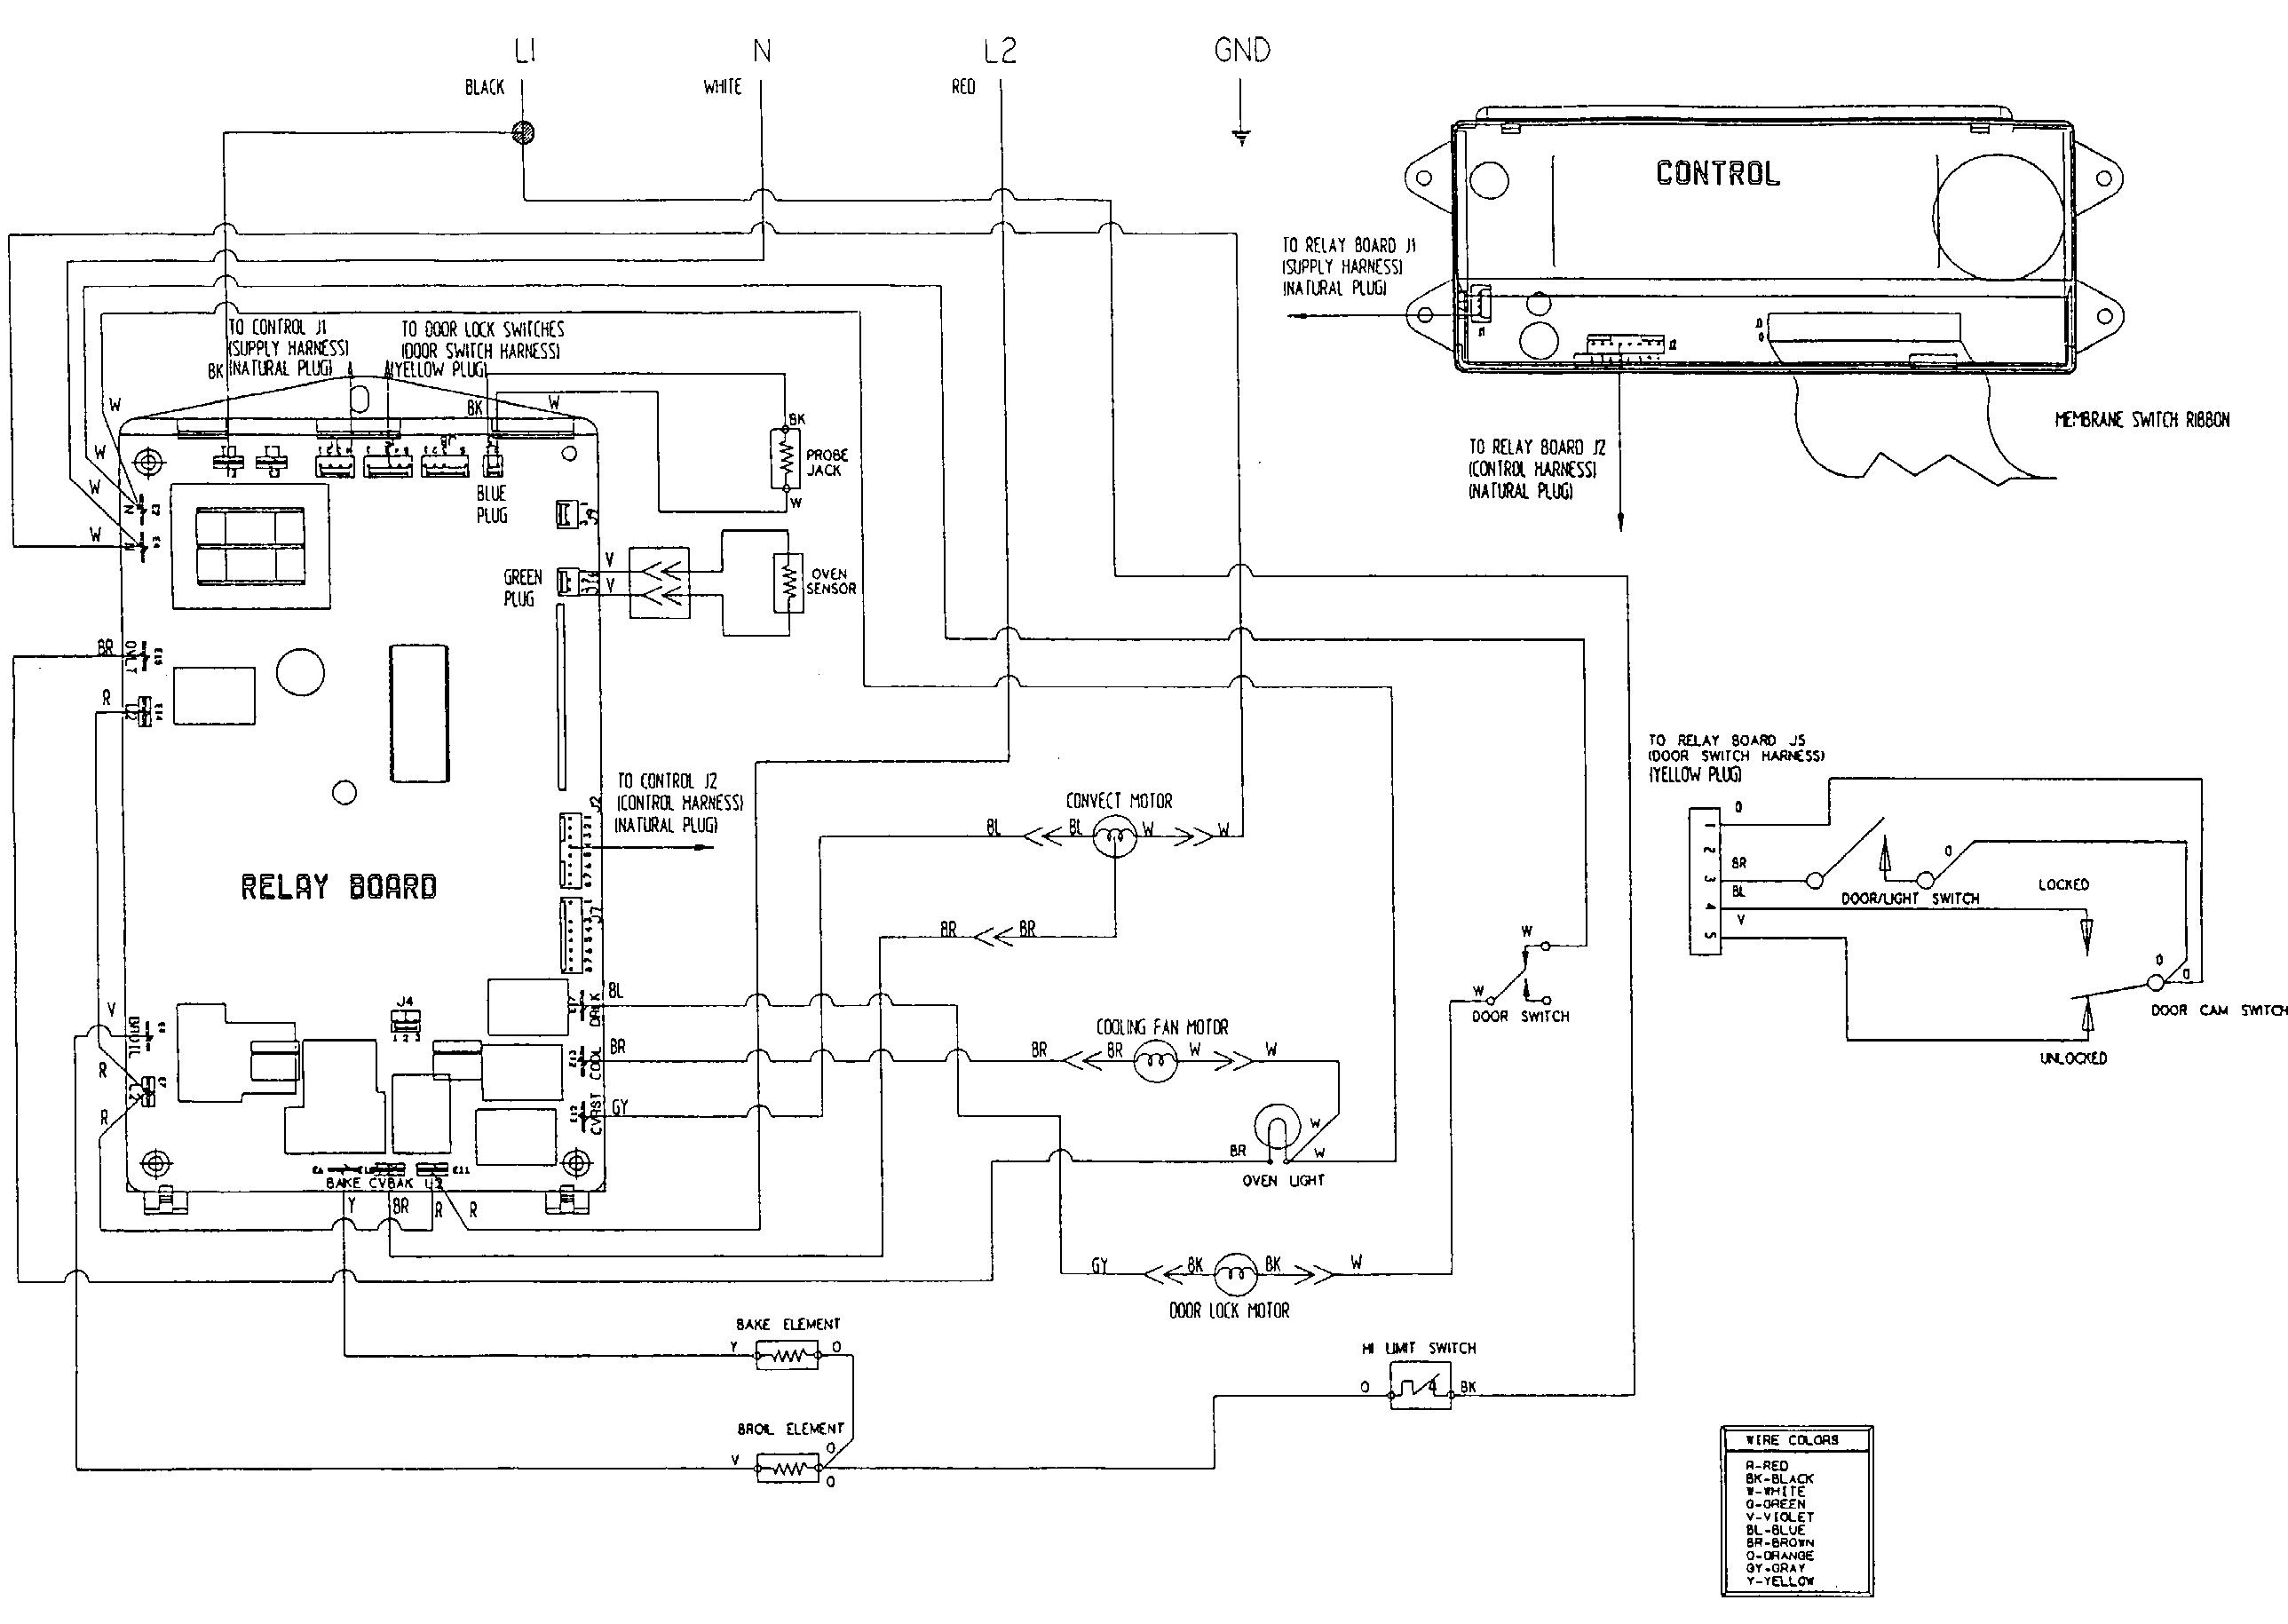 wrg 3209 ge range schematic [ 2577 x 1829 Pixel ]